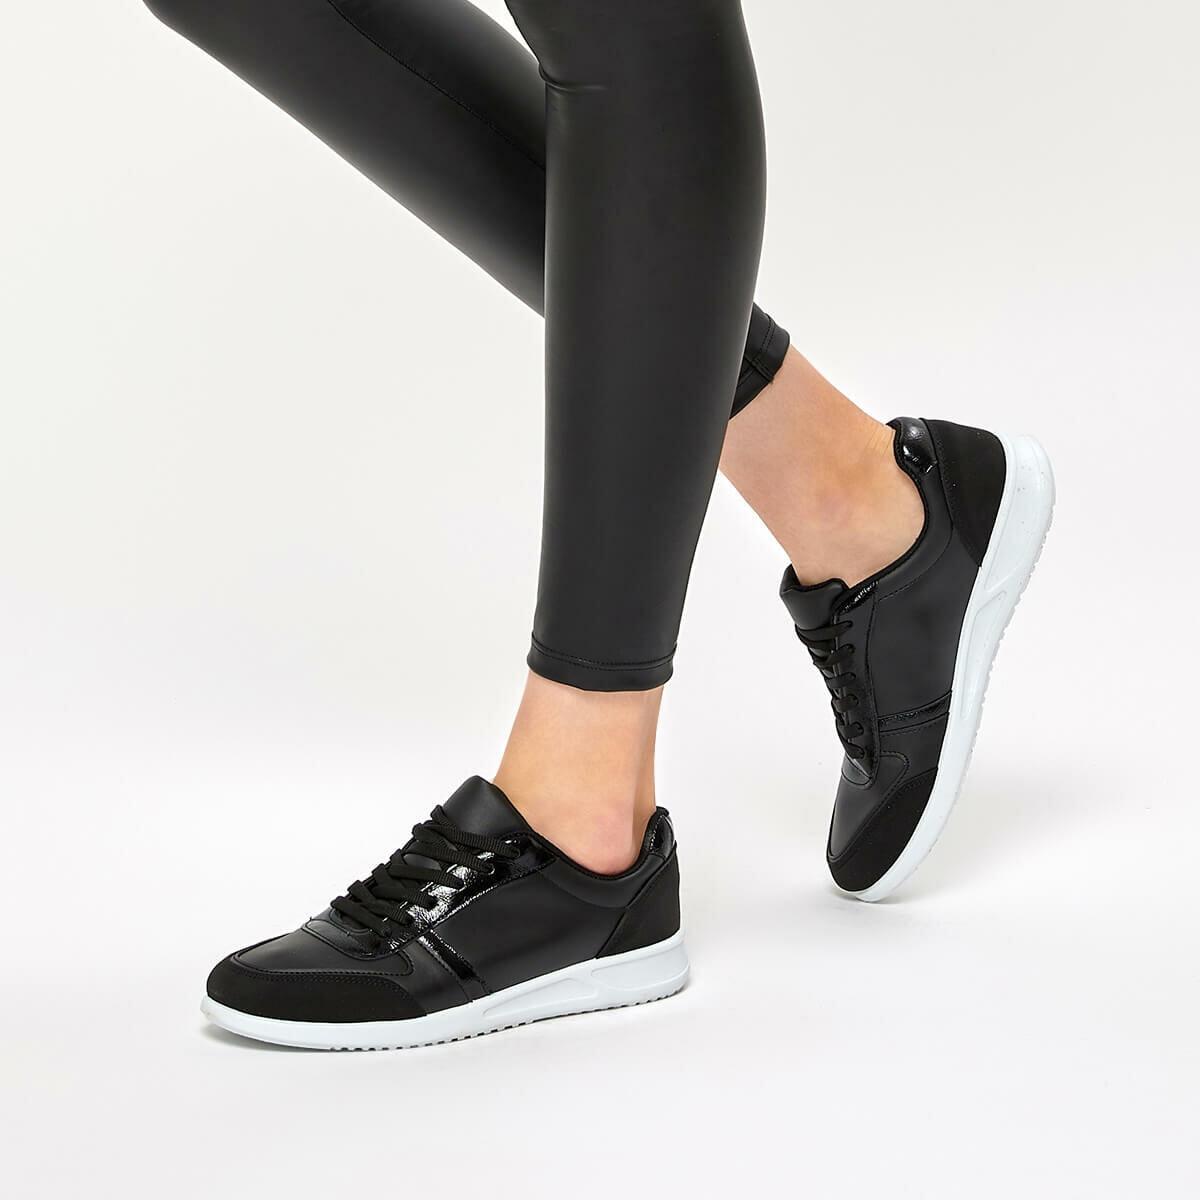 FLO 92. 314856.Z Black Women Sneaker Polaris